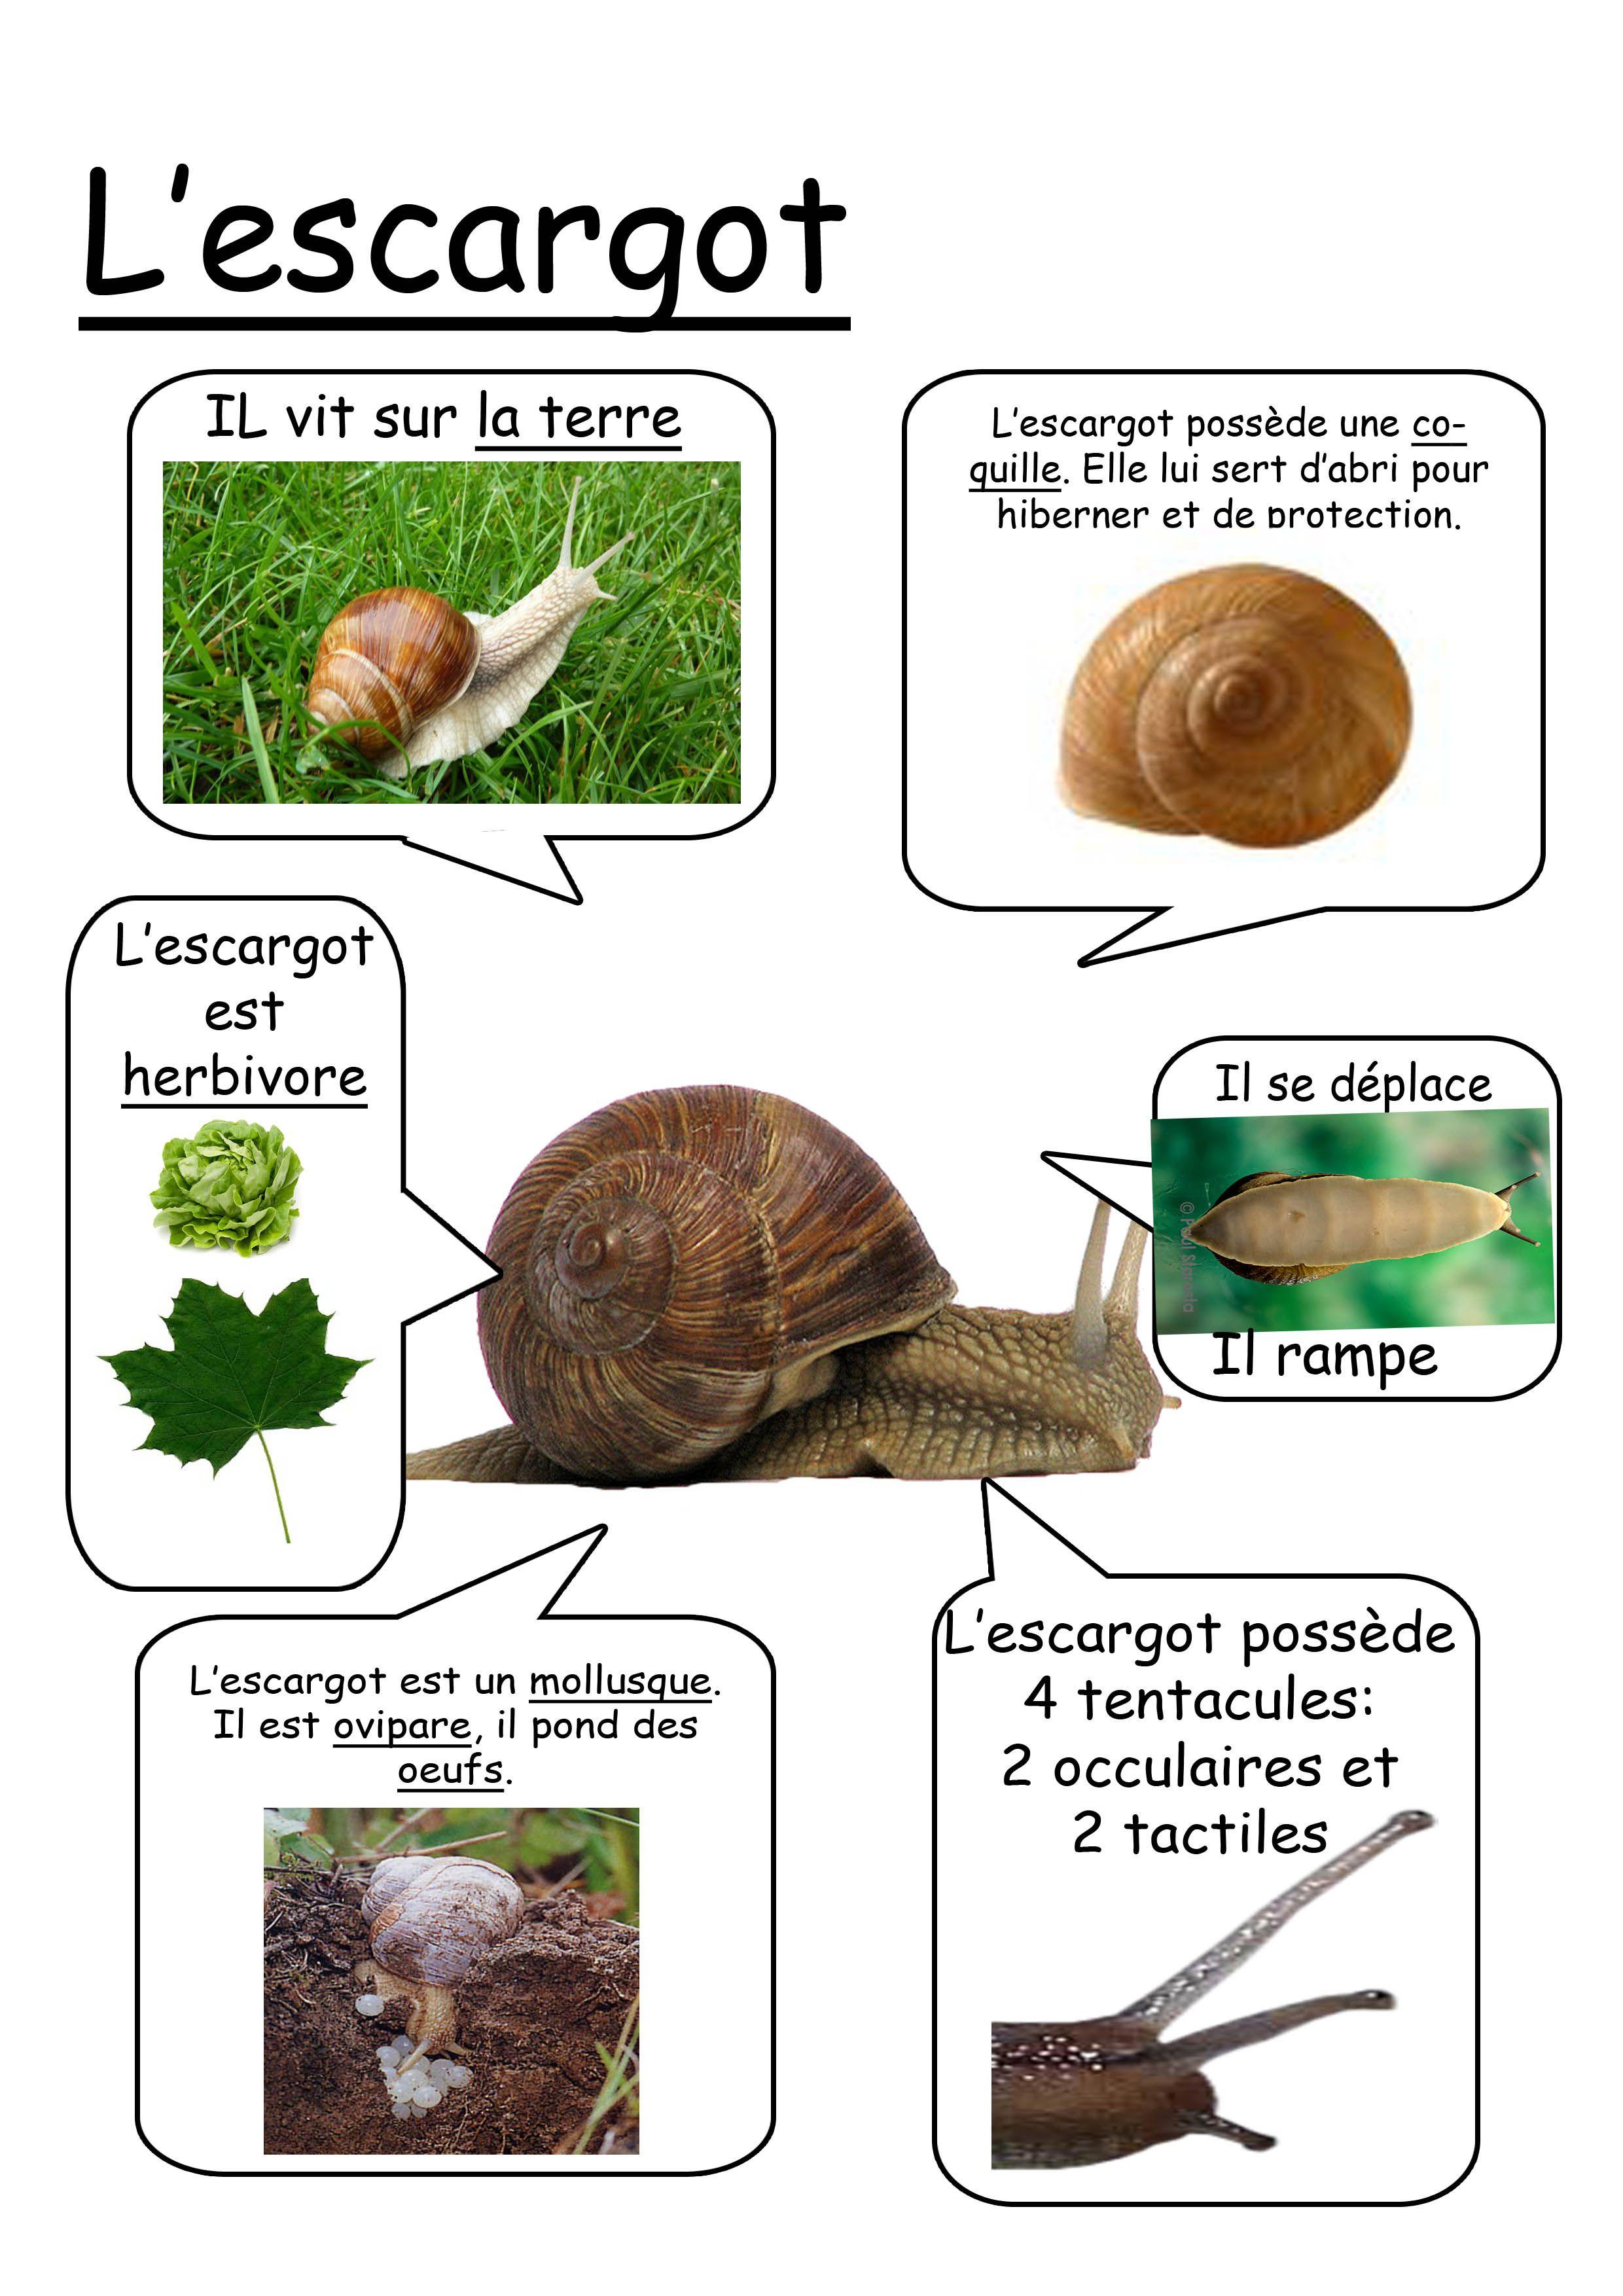 Fiche escargot maternelle pinterest escargot maternelle et escargot maternelle - Escargot maternelle ...